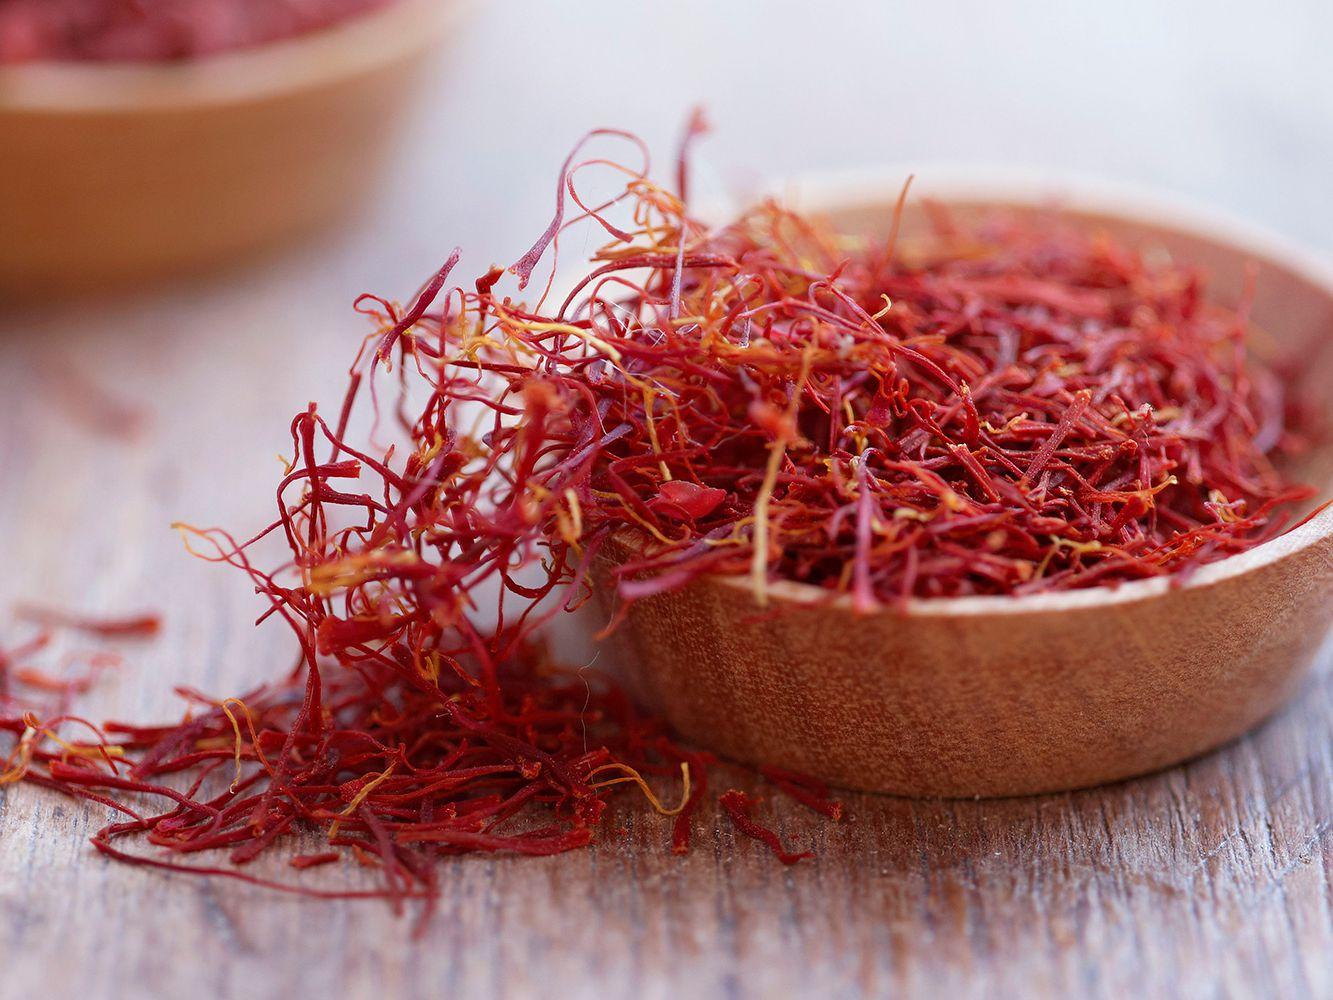 saffron threads 5a36e476842b170037d0aa86